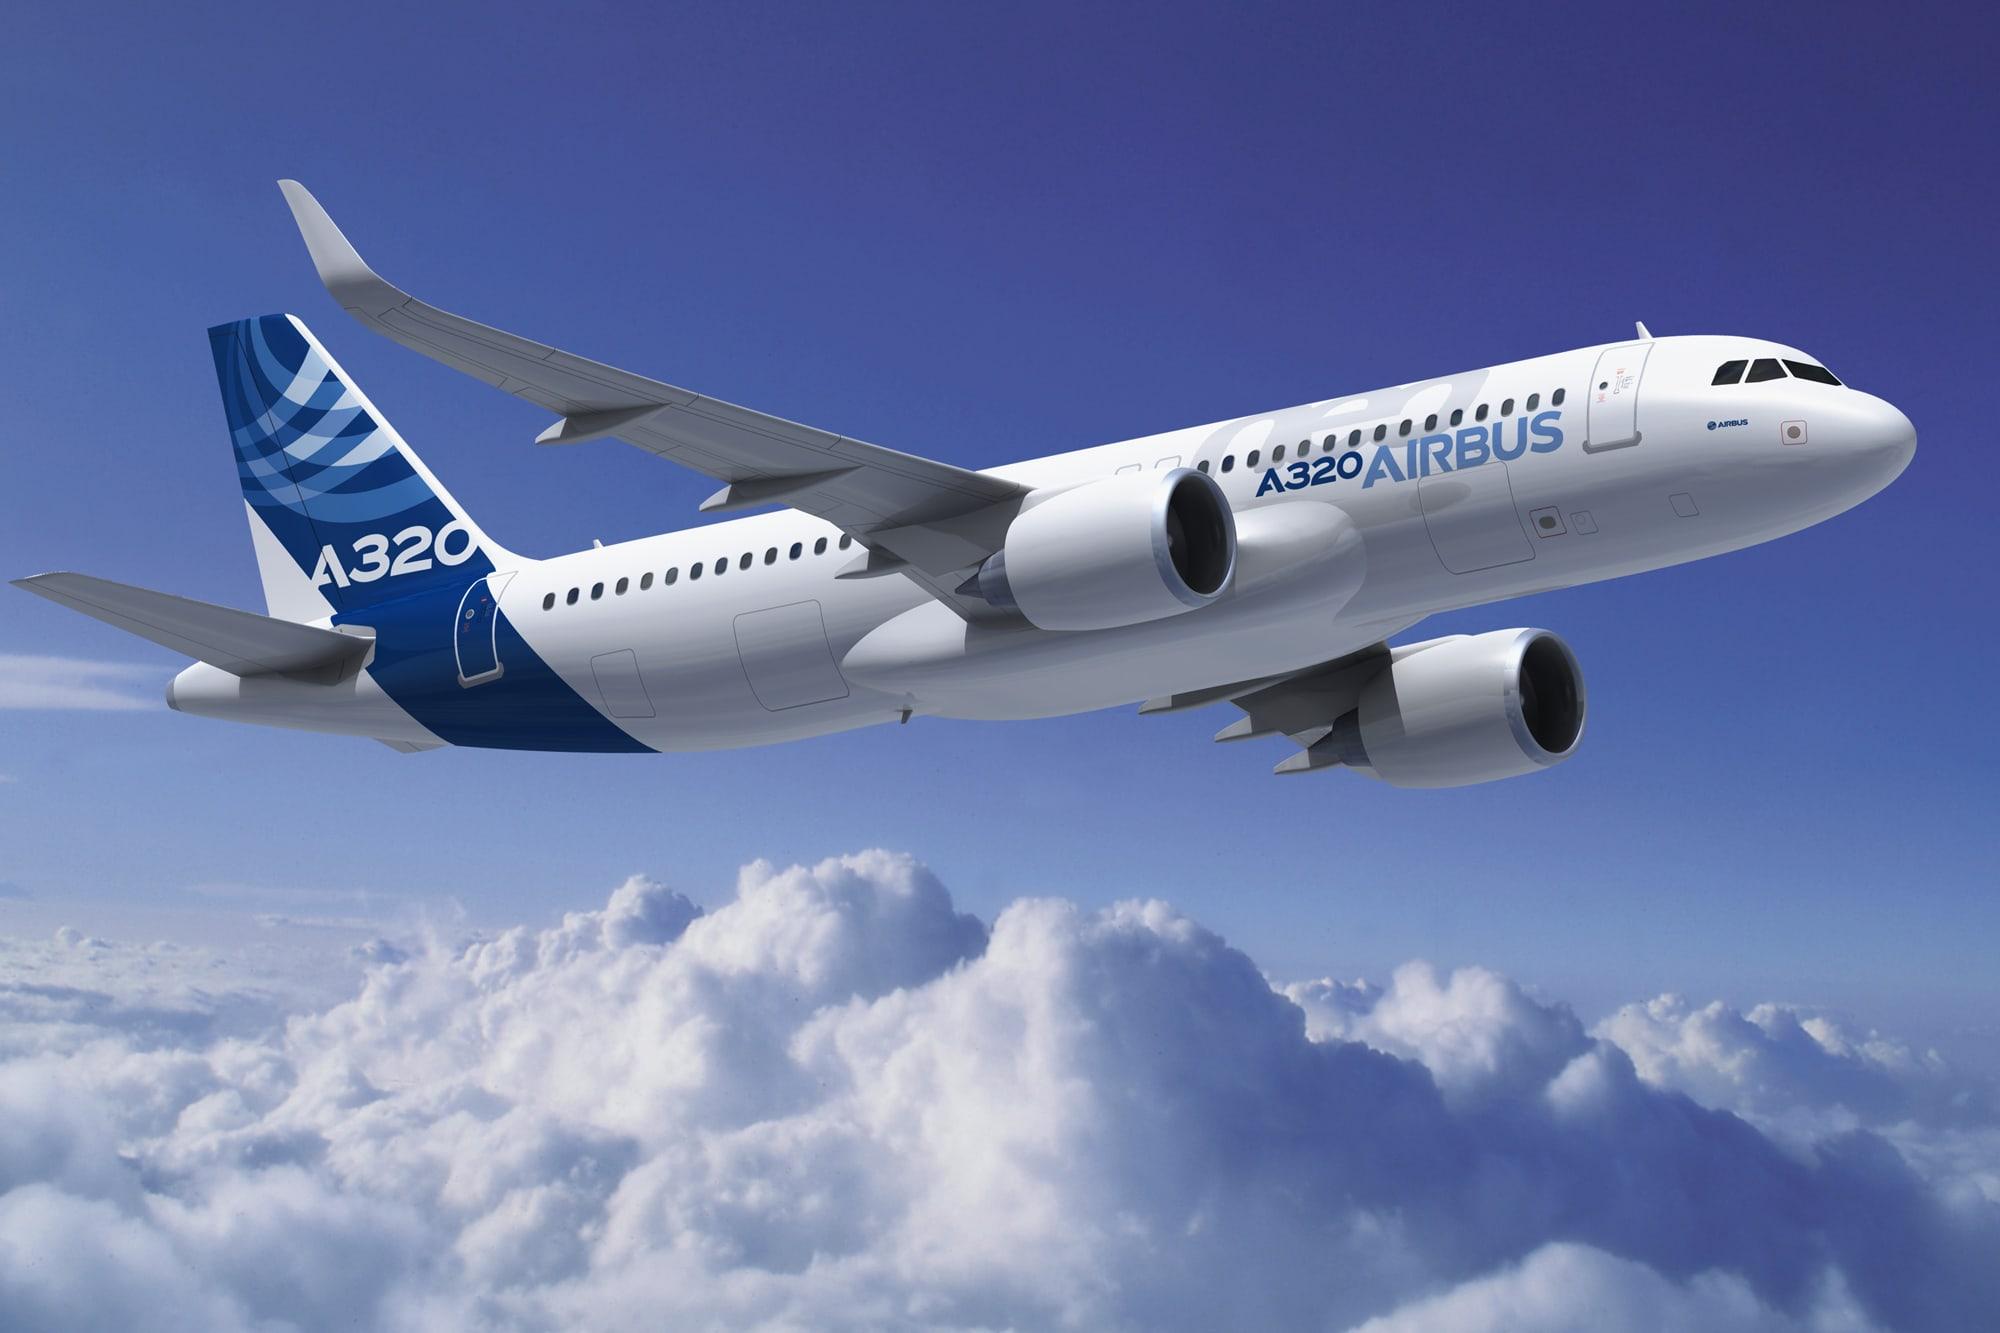 Airbus 320 - the leader of European passenger air traffic 26